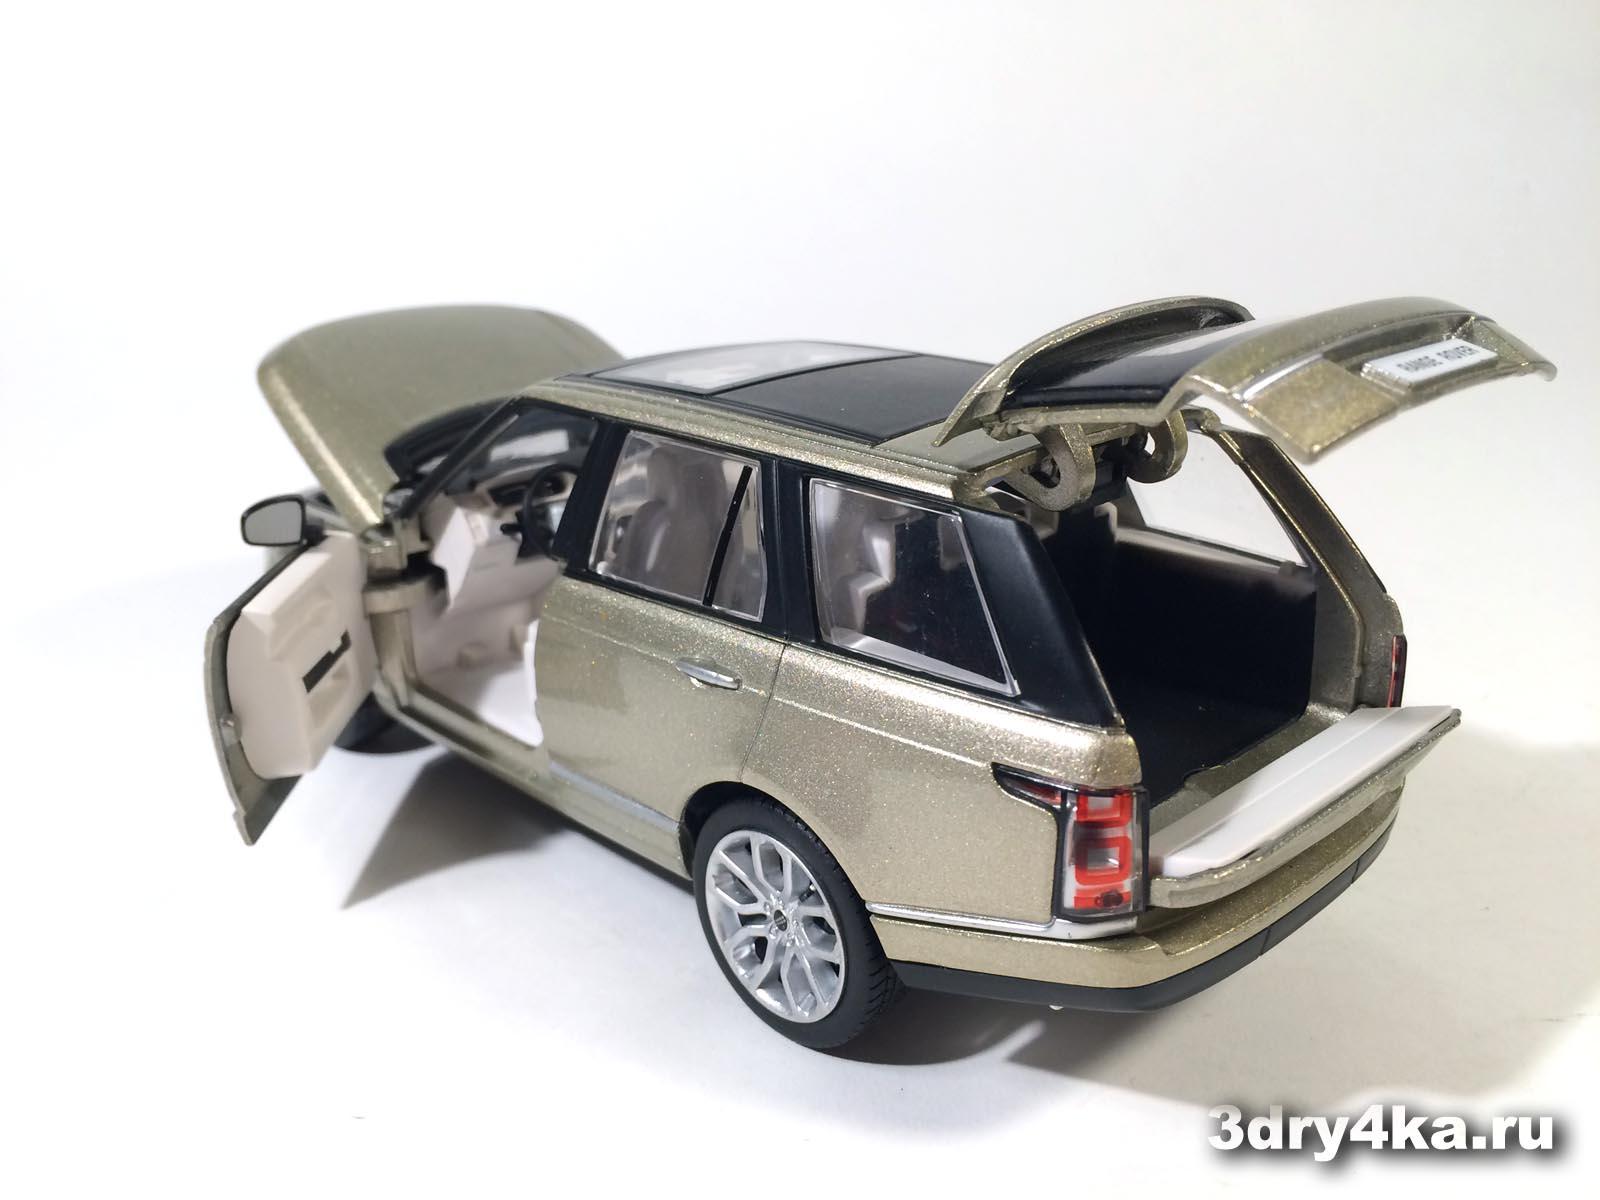 Масштабная модель Land Rover Range Rover Voque от IDEAL, вид сзади  (масштаб 1:24)